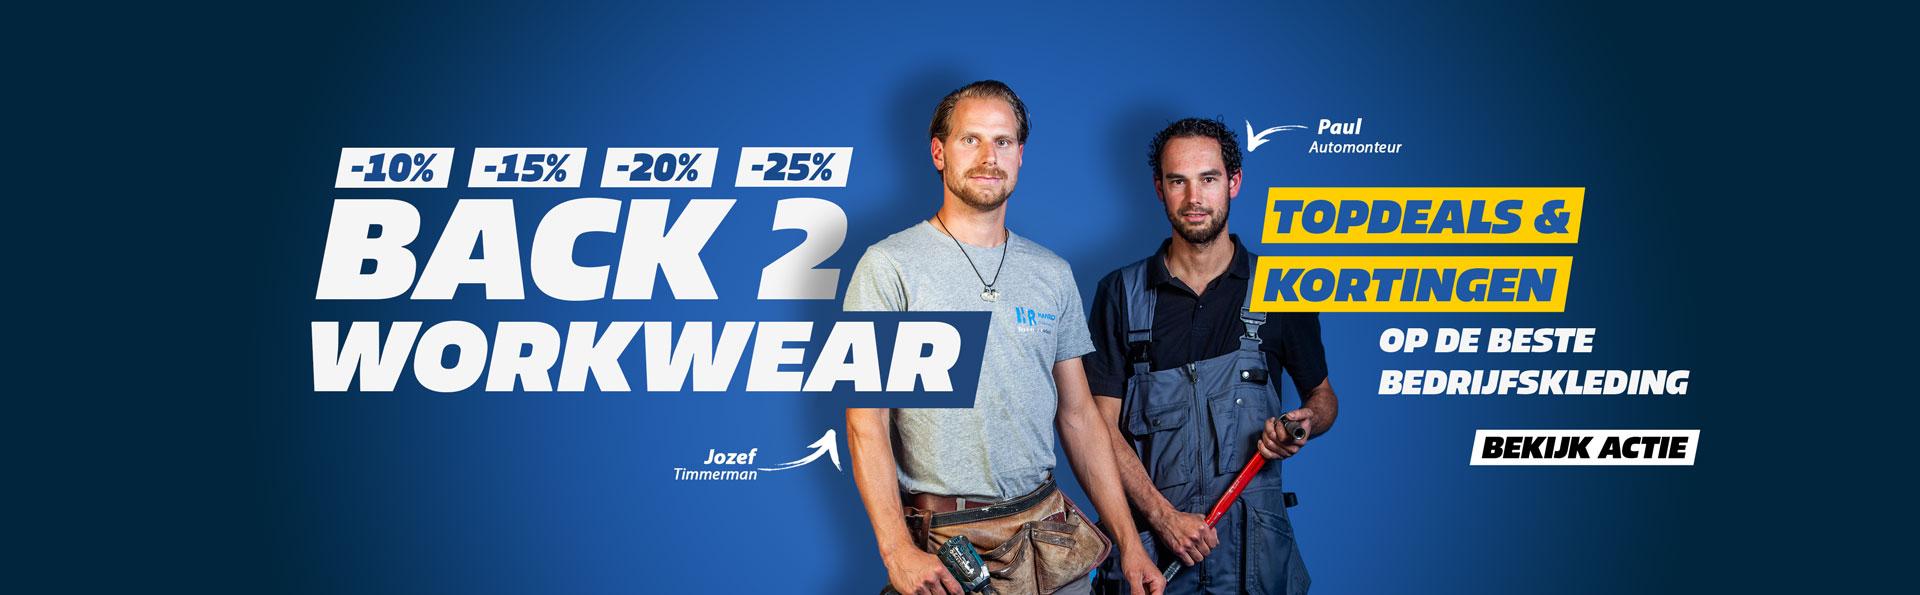 202109 - Back2Workwear